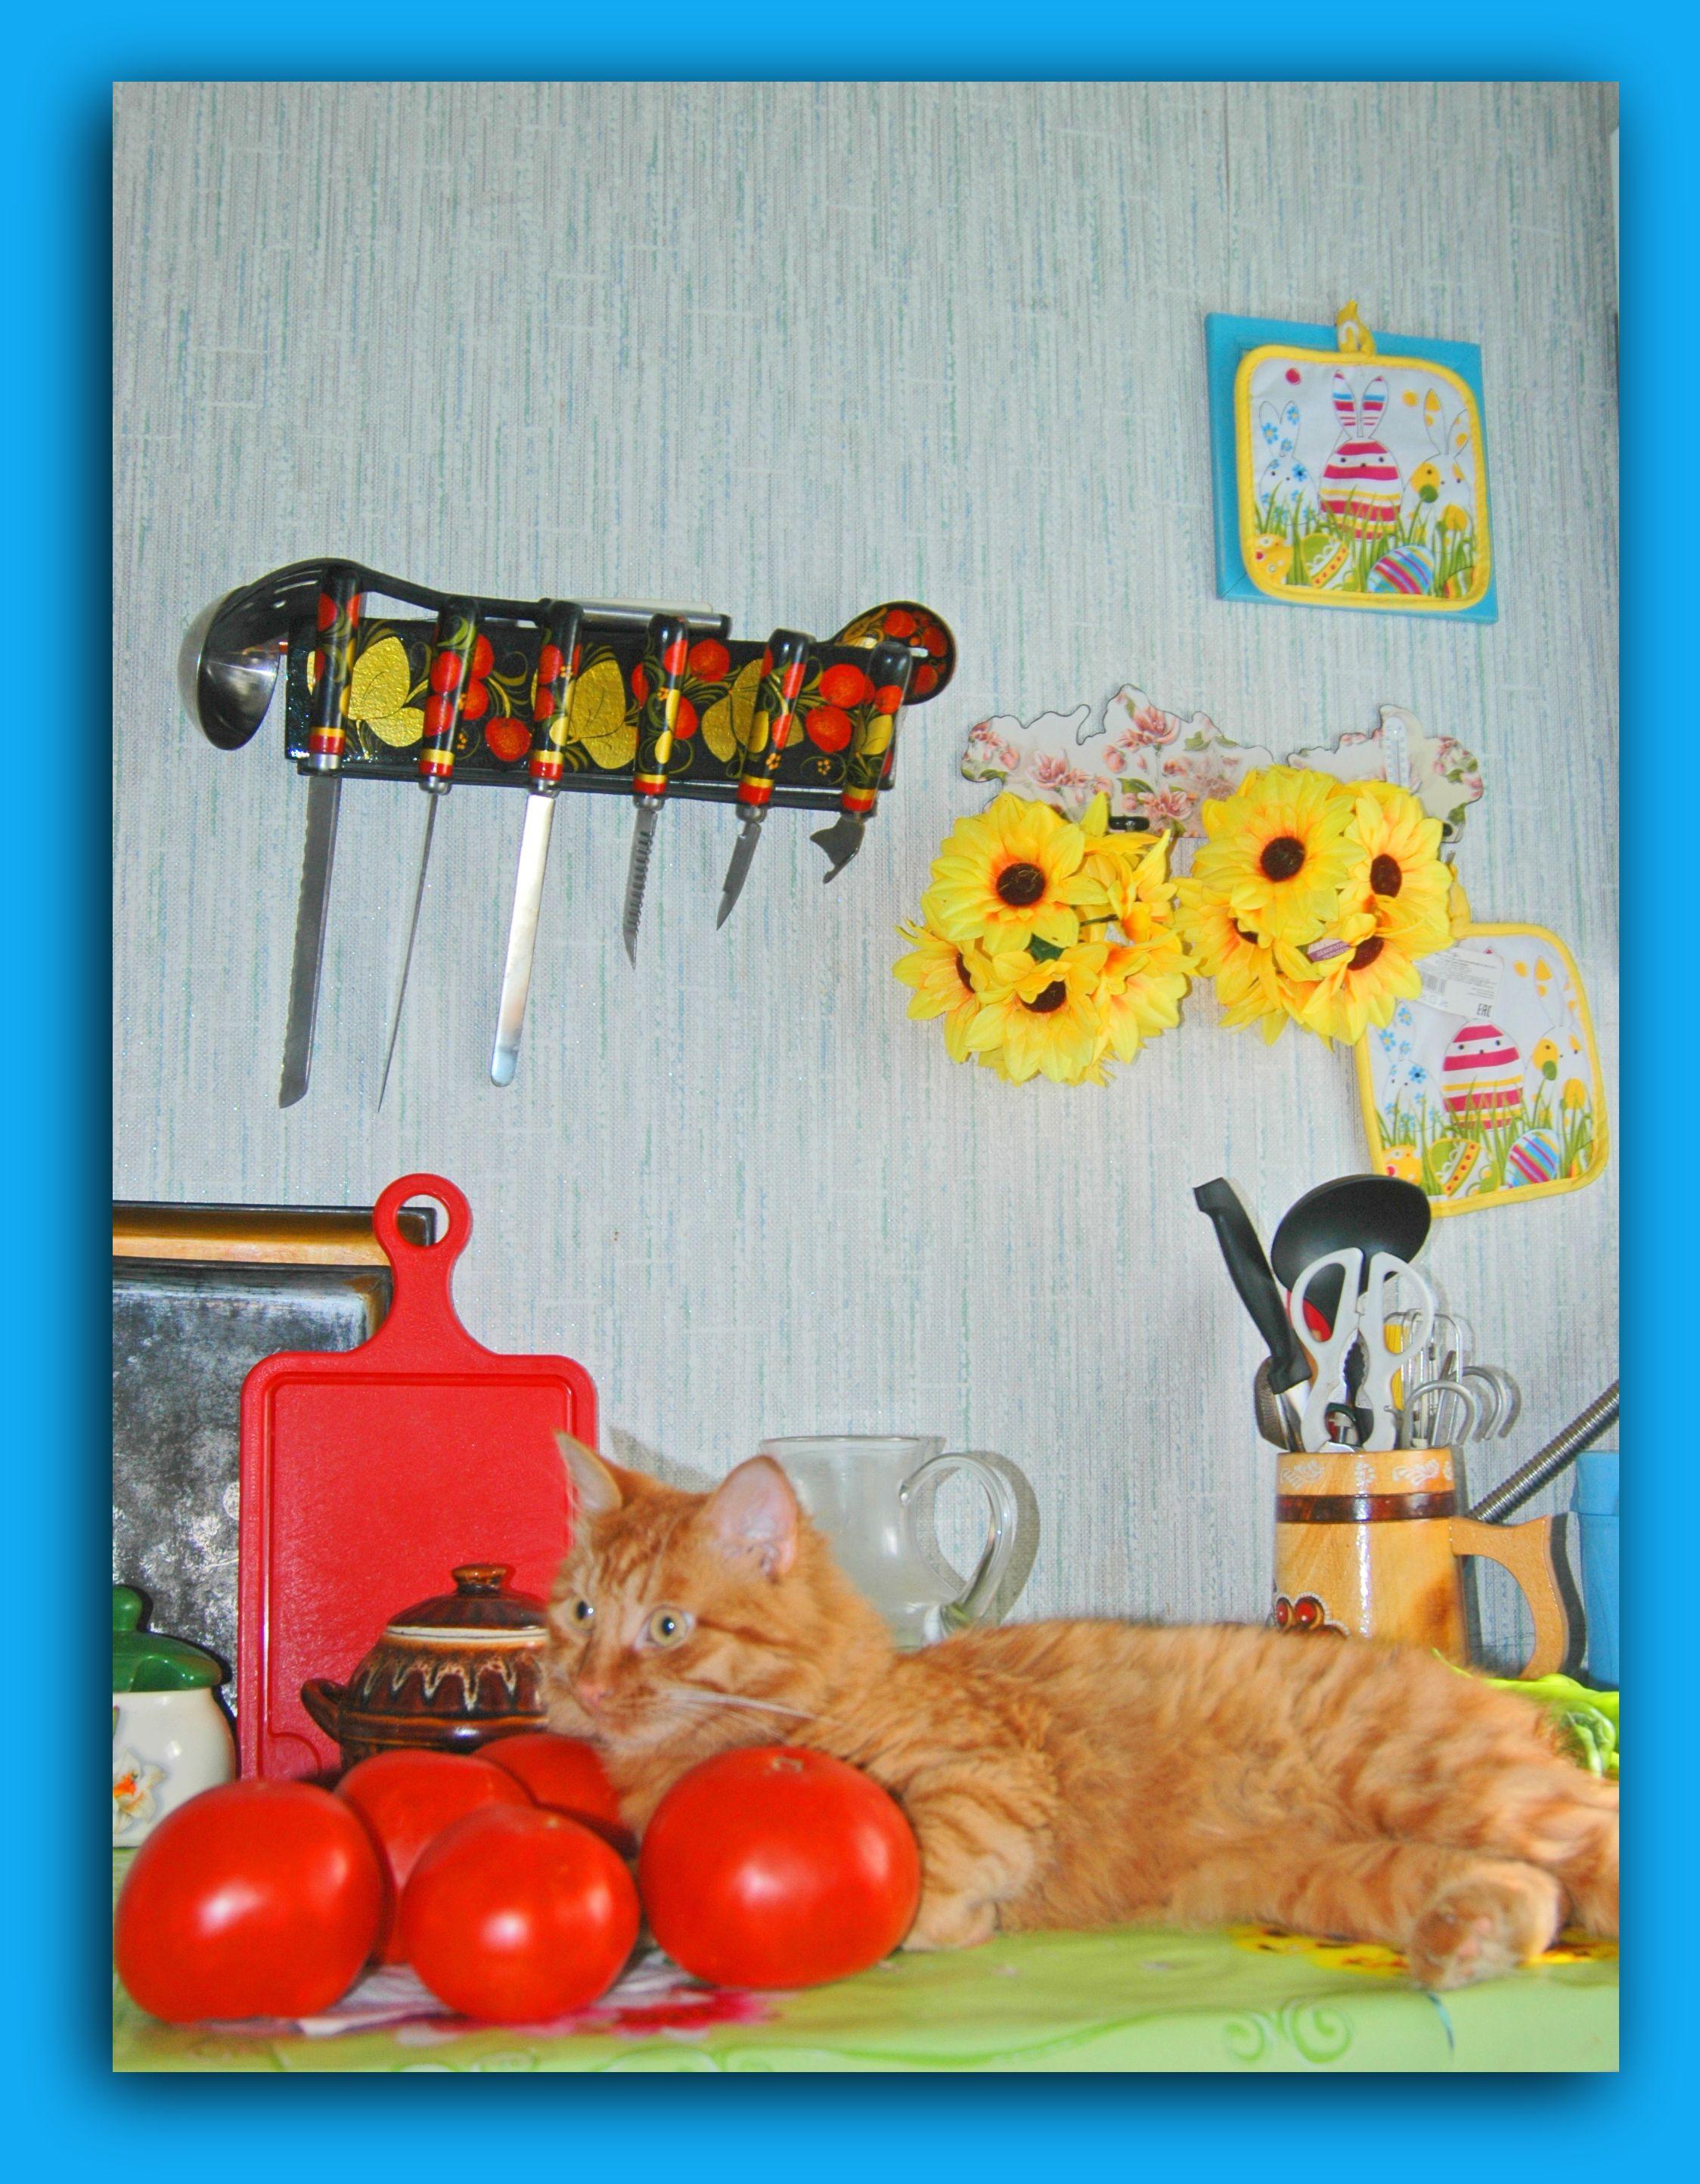 кот в помидорах.